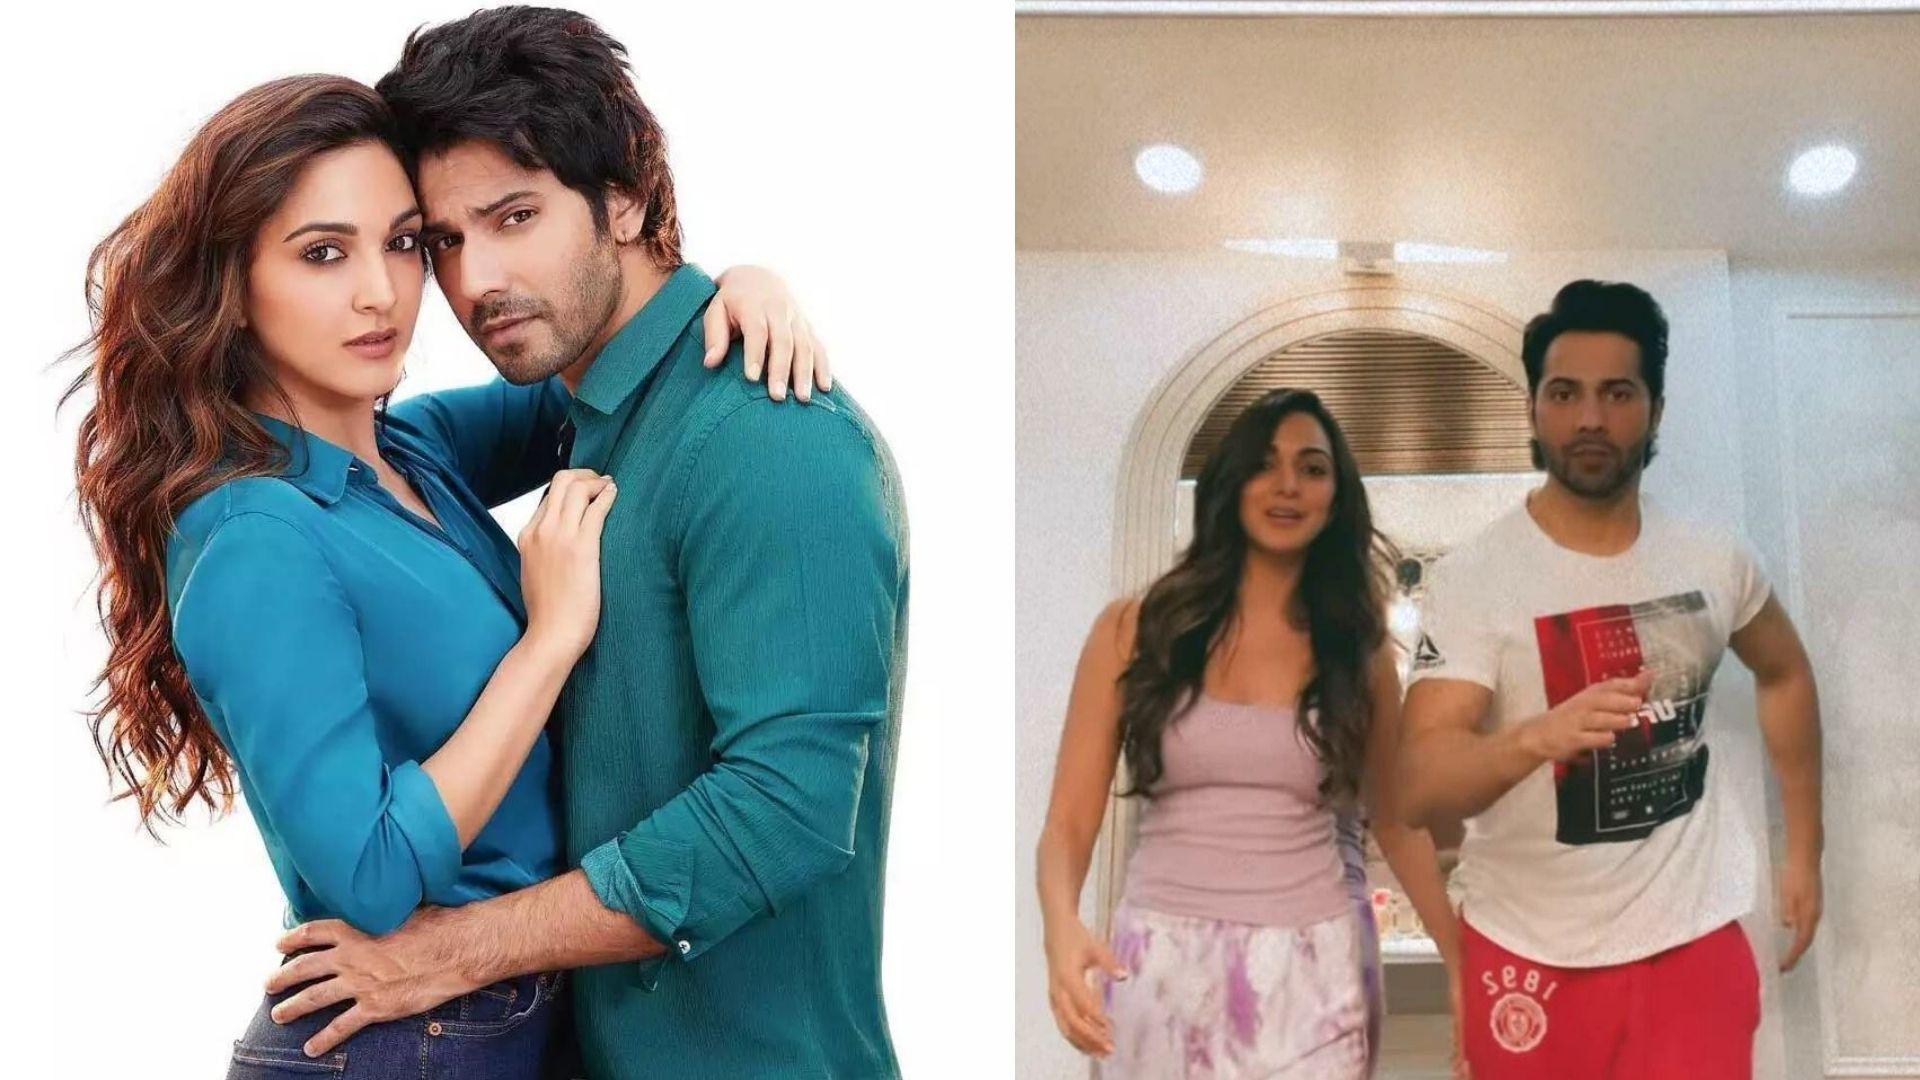 Jug Jugg Jeeyo: Kiara Advani And Varun Dhawan Groove On Diljit Dosanjh's Lover; Flaunt Lithe Moves While 'Being Adults' In Vanity Van